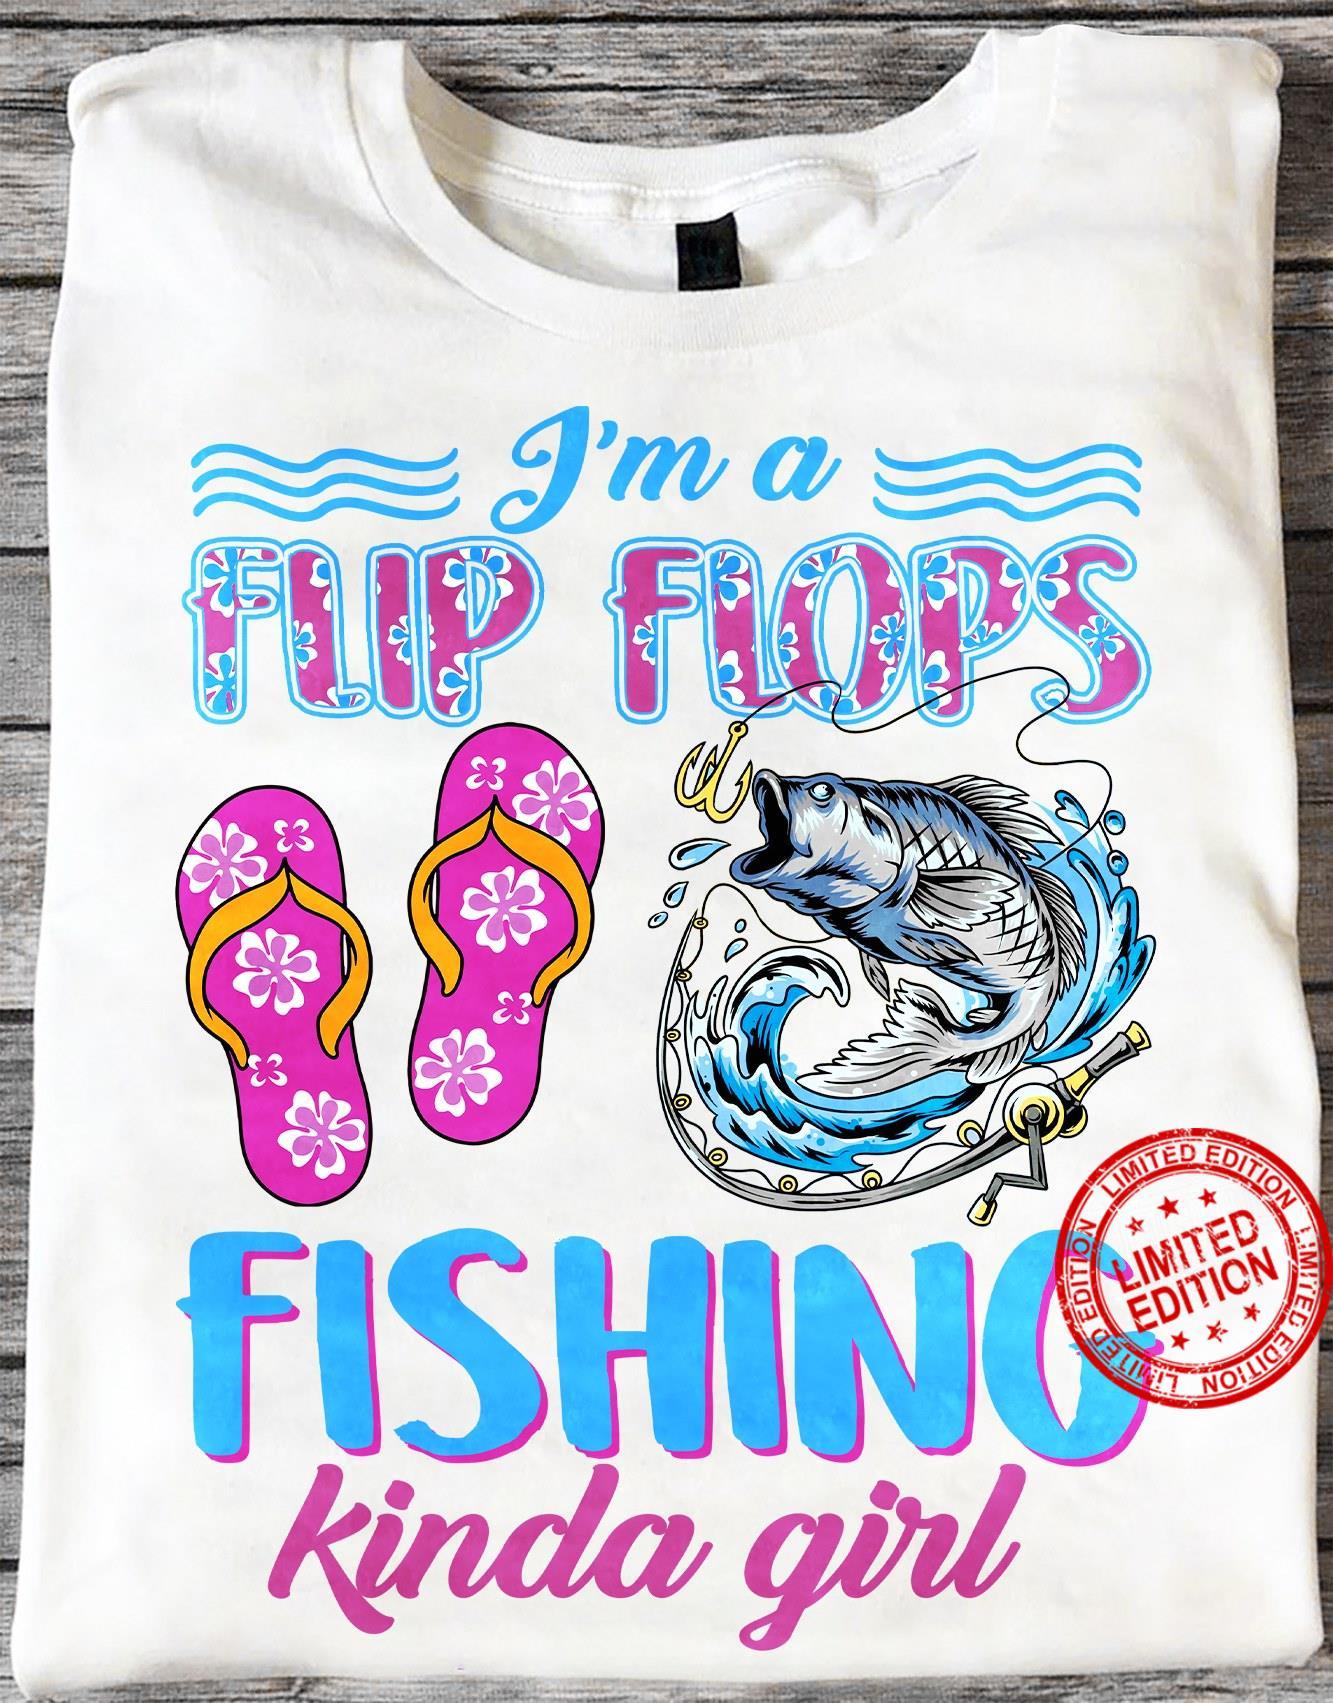 I'm A Flip Flops Fishing KInda Girl Shirt